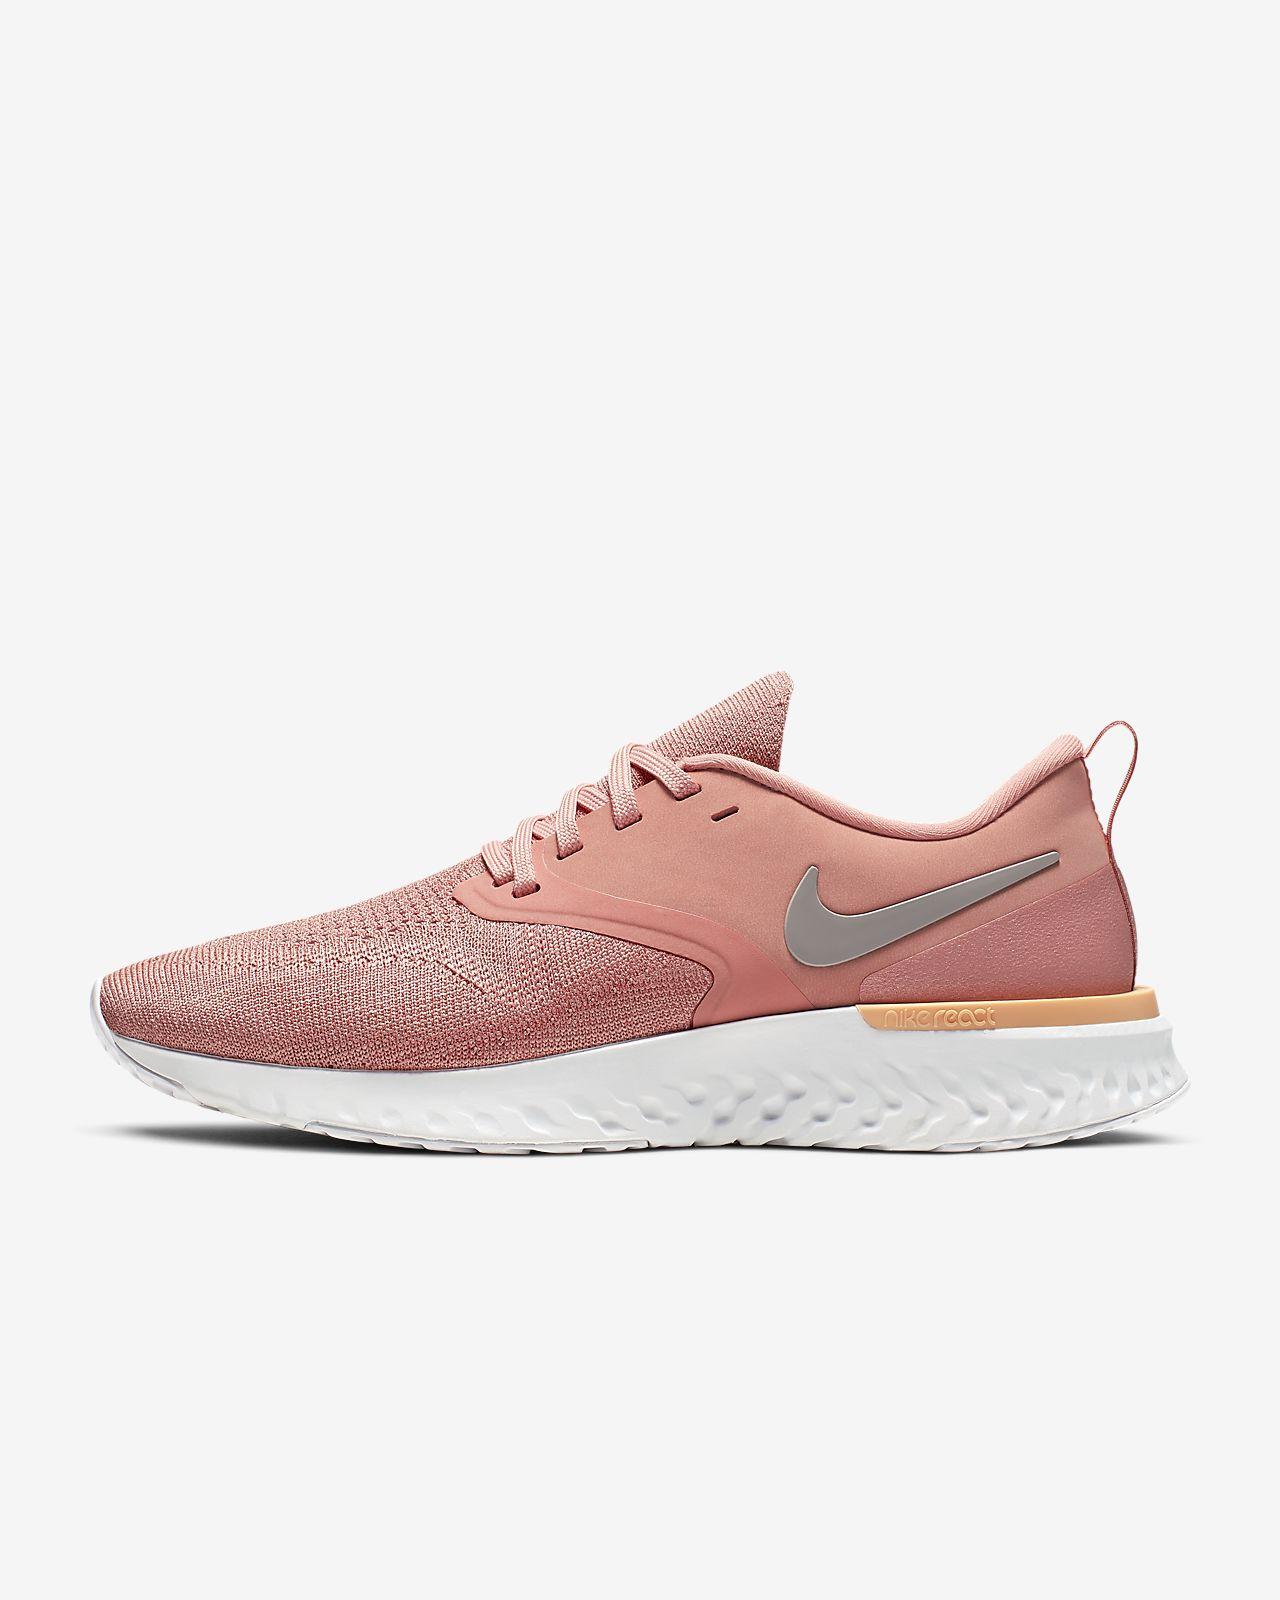 Nike Odyssey React Flyknit 2 女款跑鞋